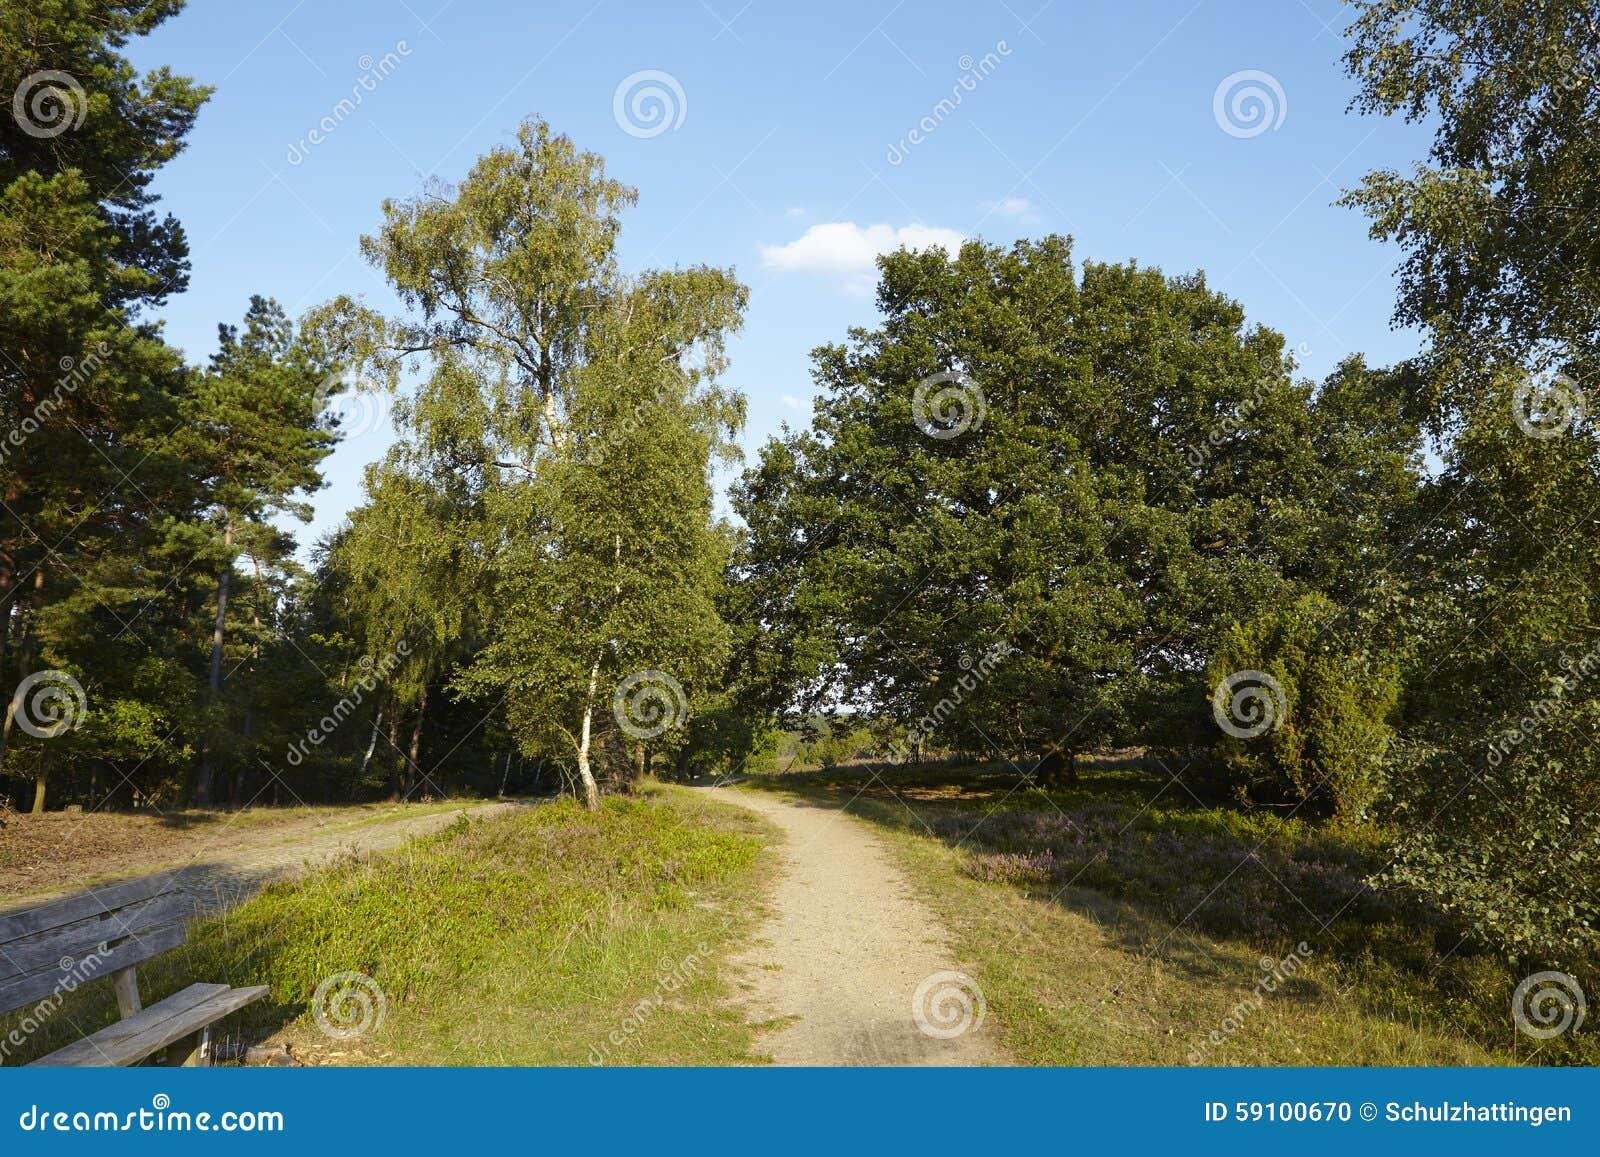 Luneburg荒地-有长凳的远足道路